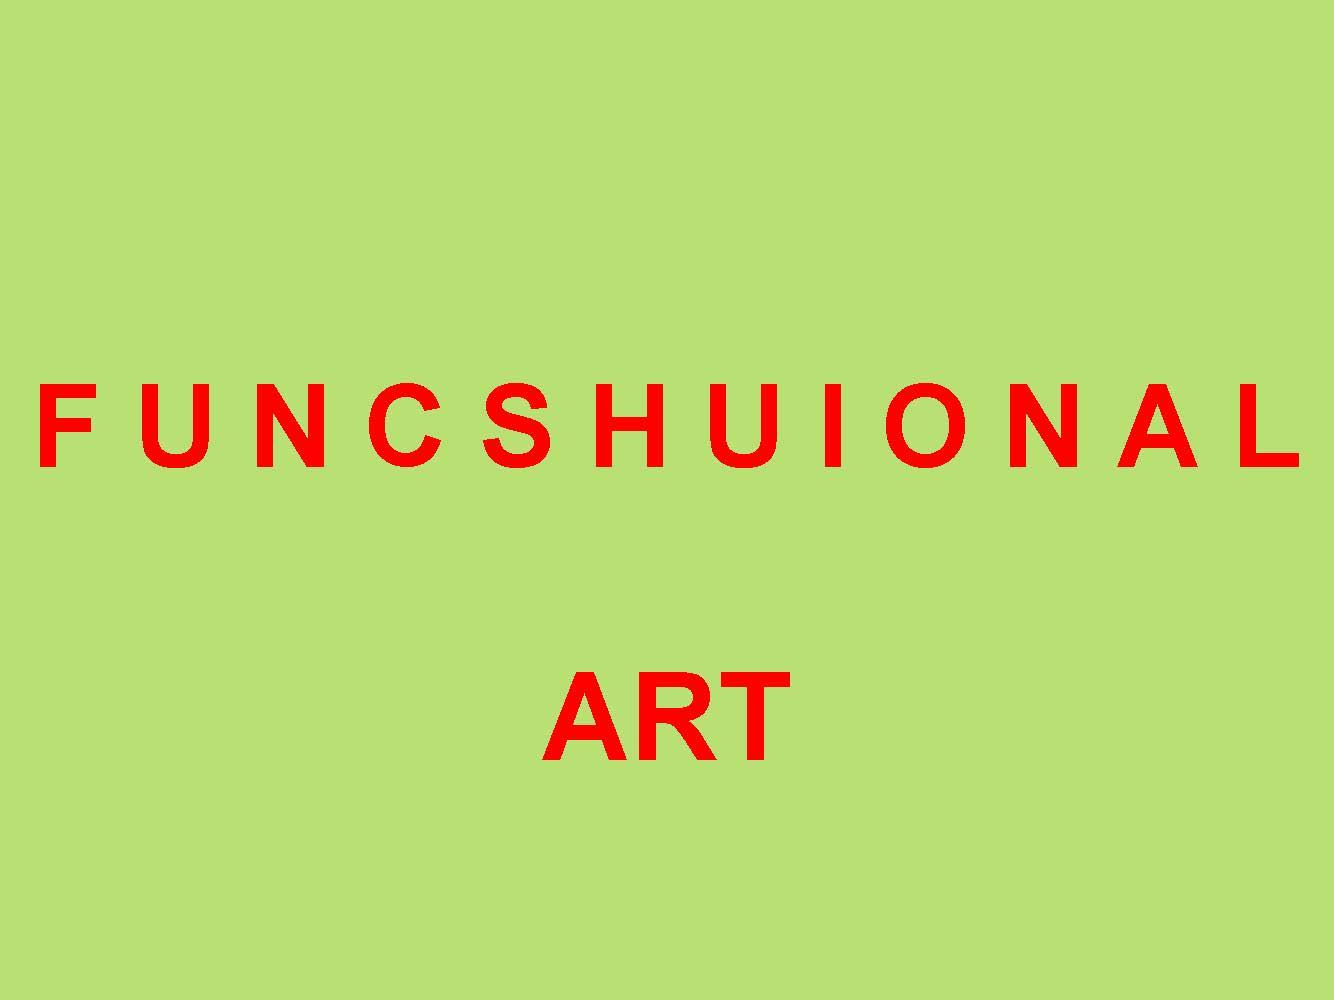 Funcshuional Art